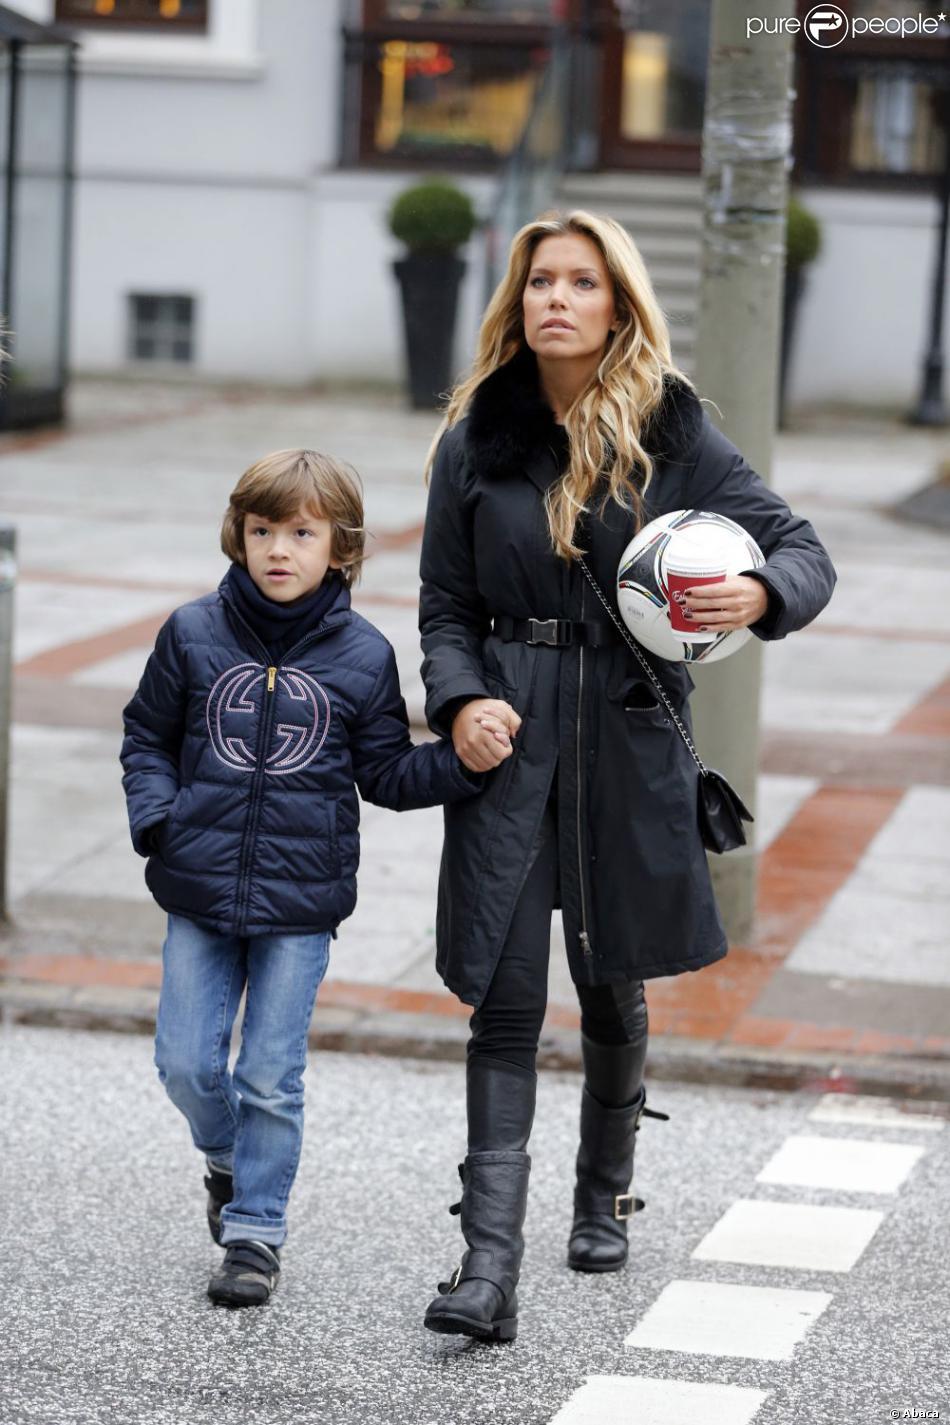 Sylvie Van der Vaart et son fils Damian dans les rues de Hambourg le 6 janvier 2013